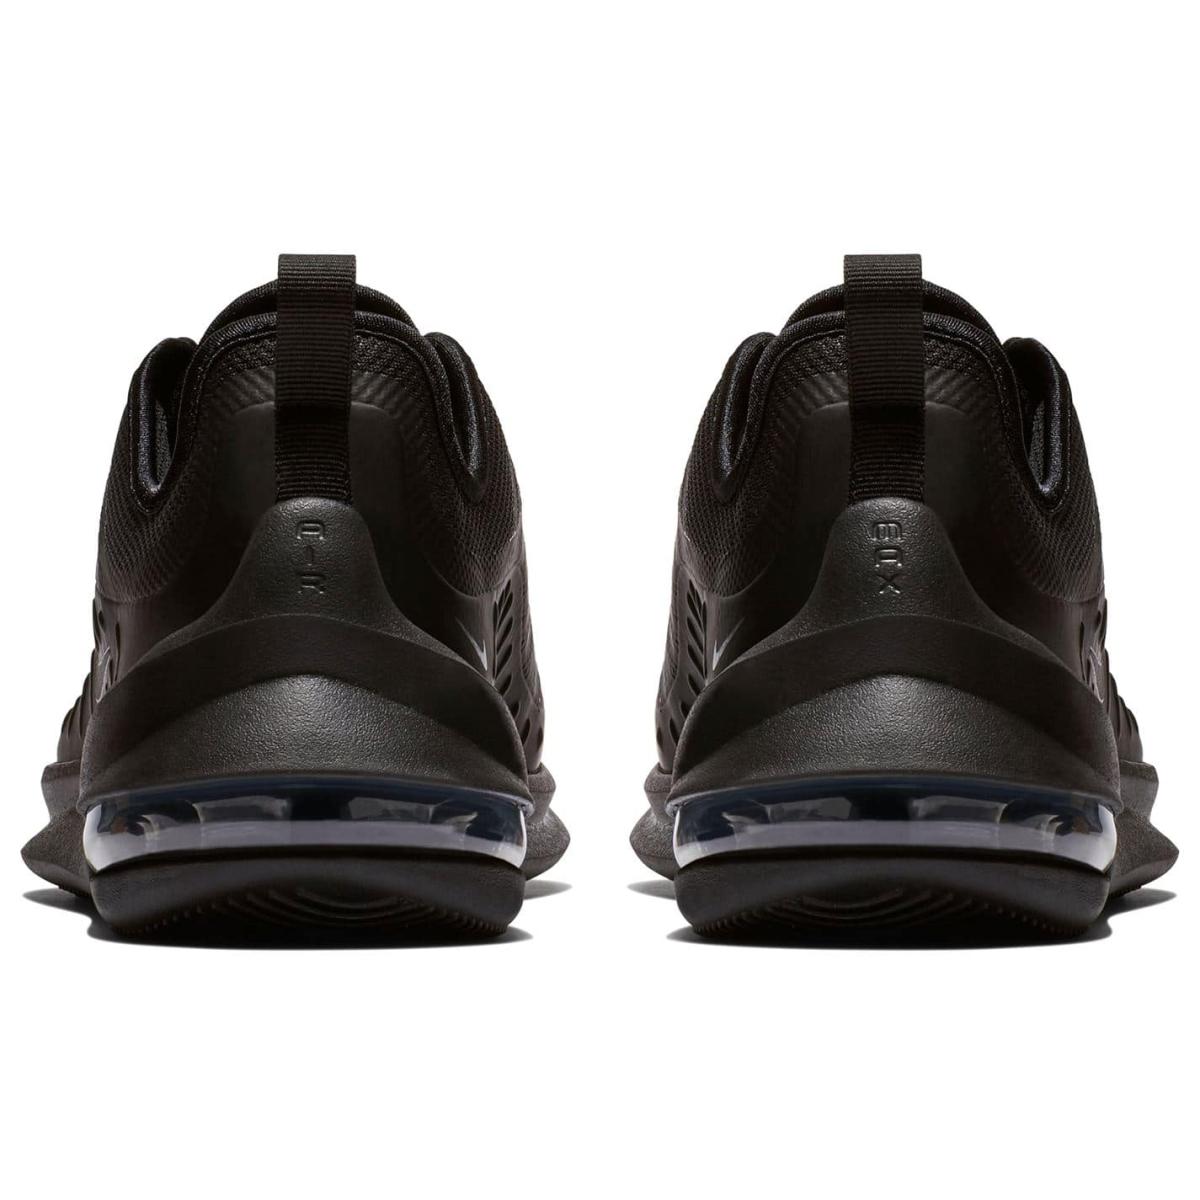 NIKE-Air-Max-Axis-Scarpe-da-ginnastica-Scarpe-da-Corsa-Uomo-Sneaker-Scarpe-Sportive-Fitness-1313 miniatura 12